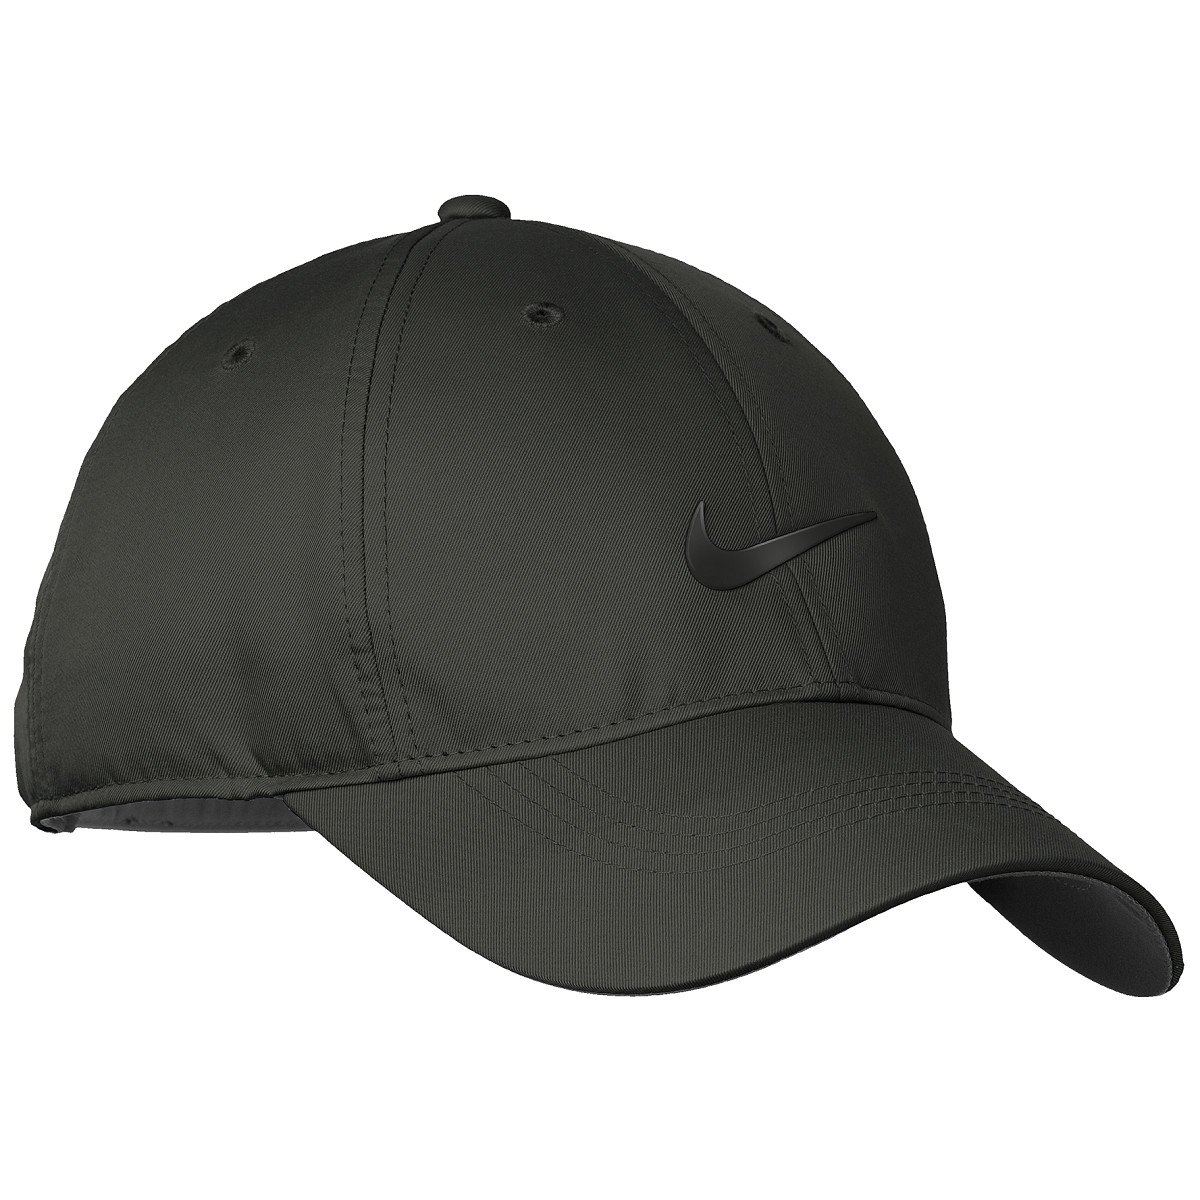 Nike Men s Golf Dri-Fit Swoosh Anthracite Front Cap (Black)  Amazon.in   Clothing   Accessories 89e85e4c8d43